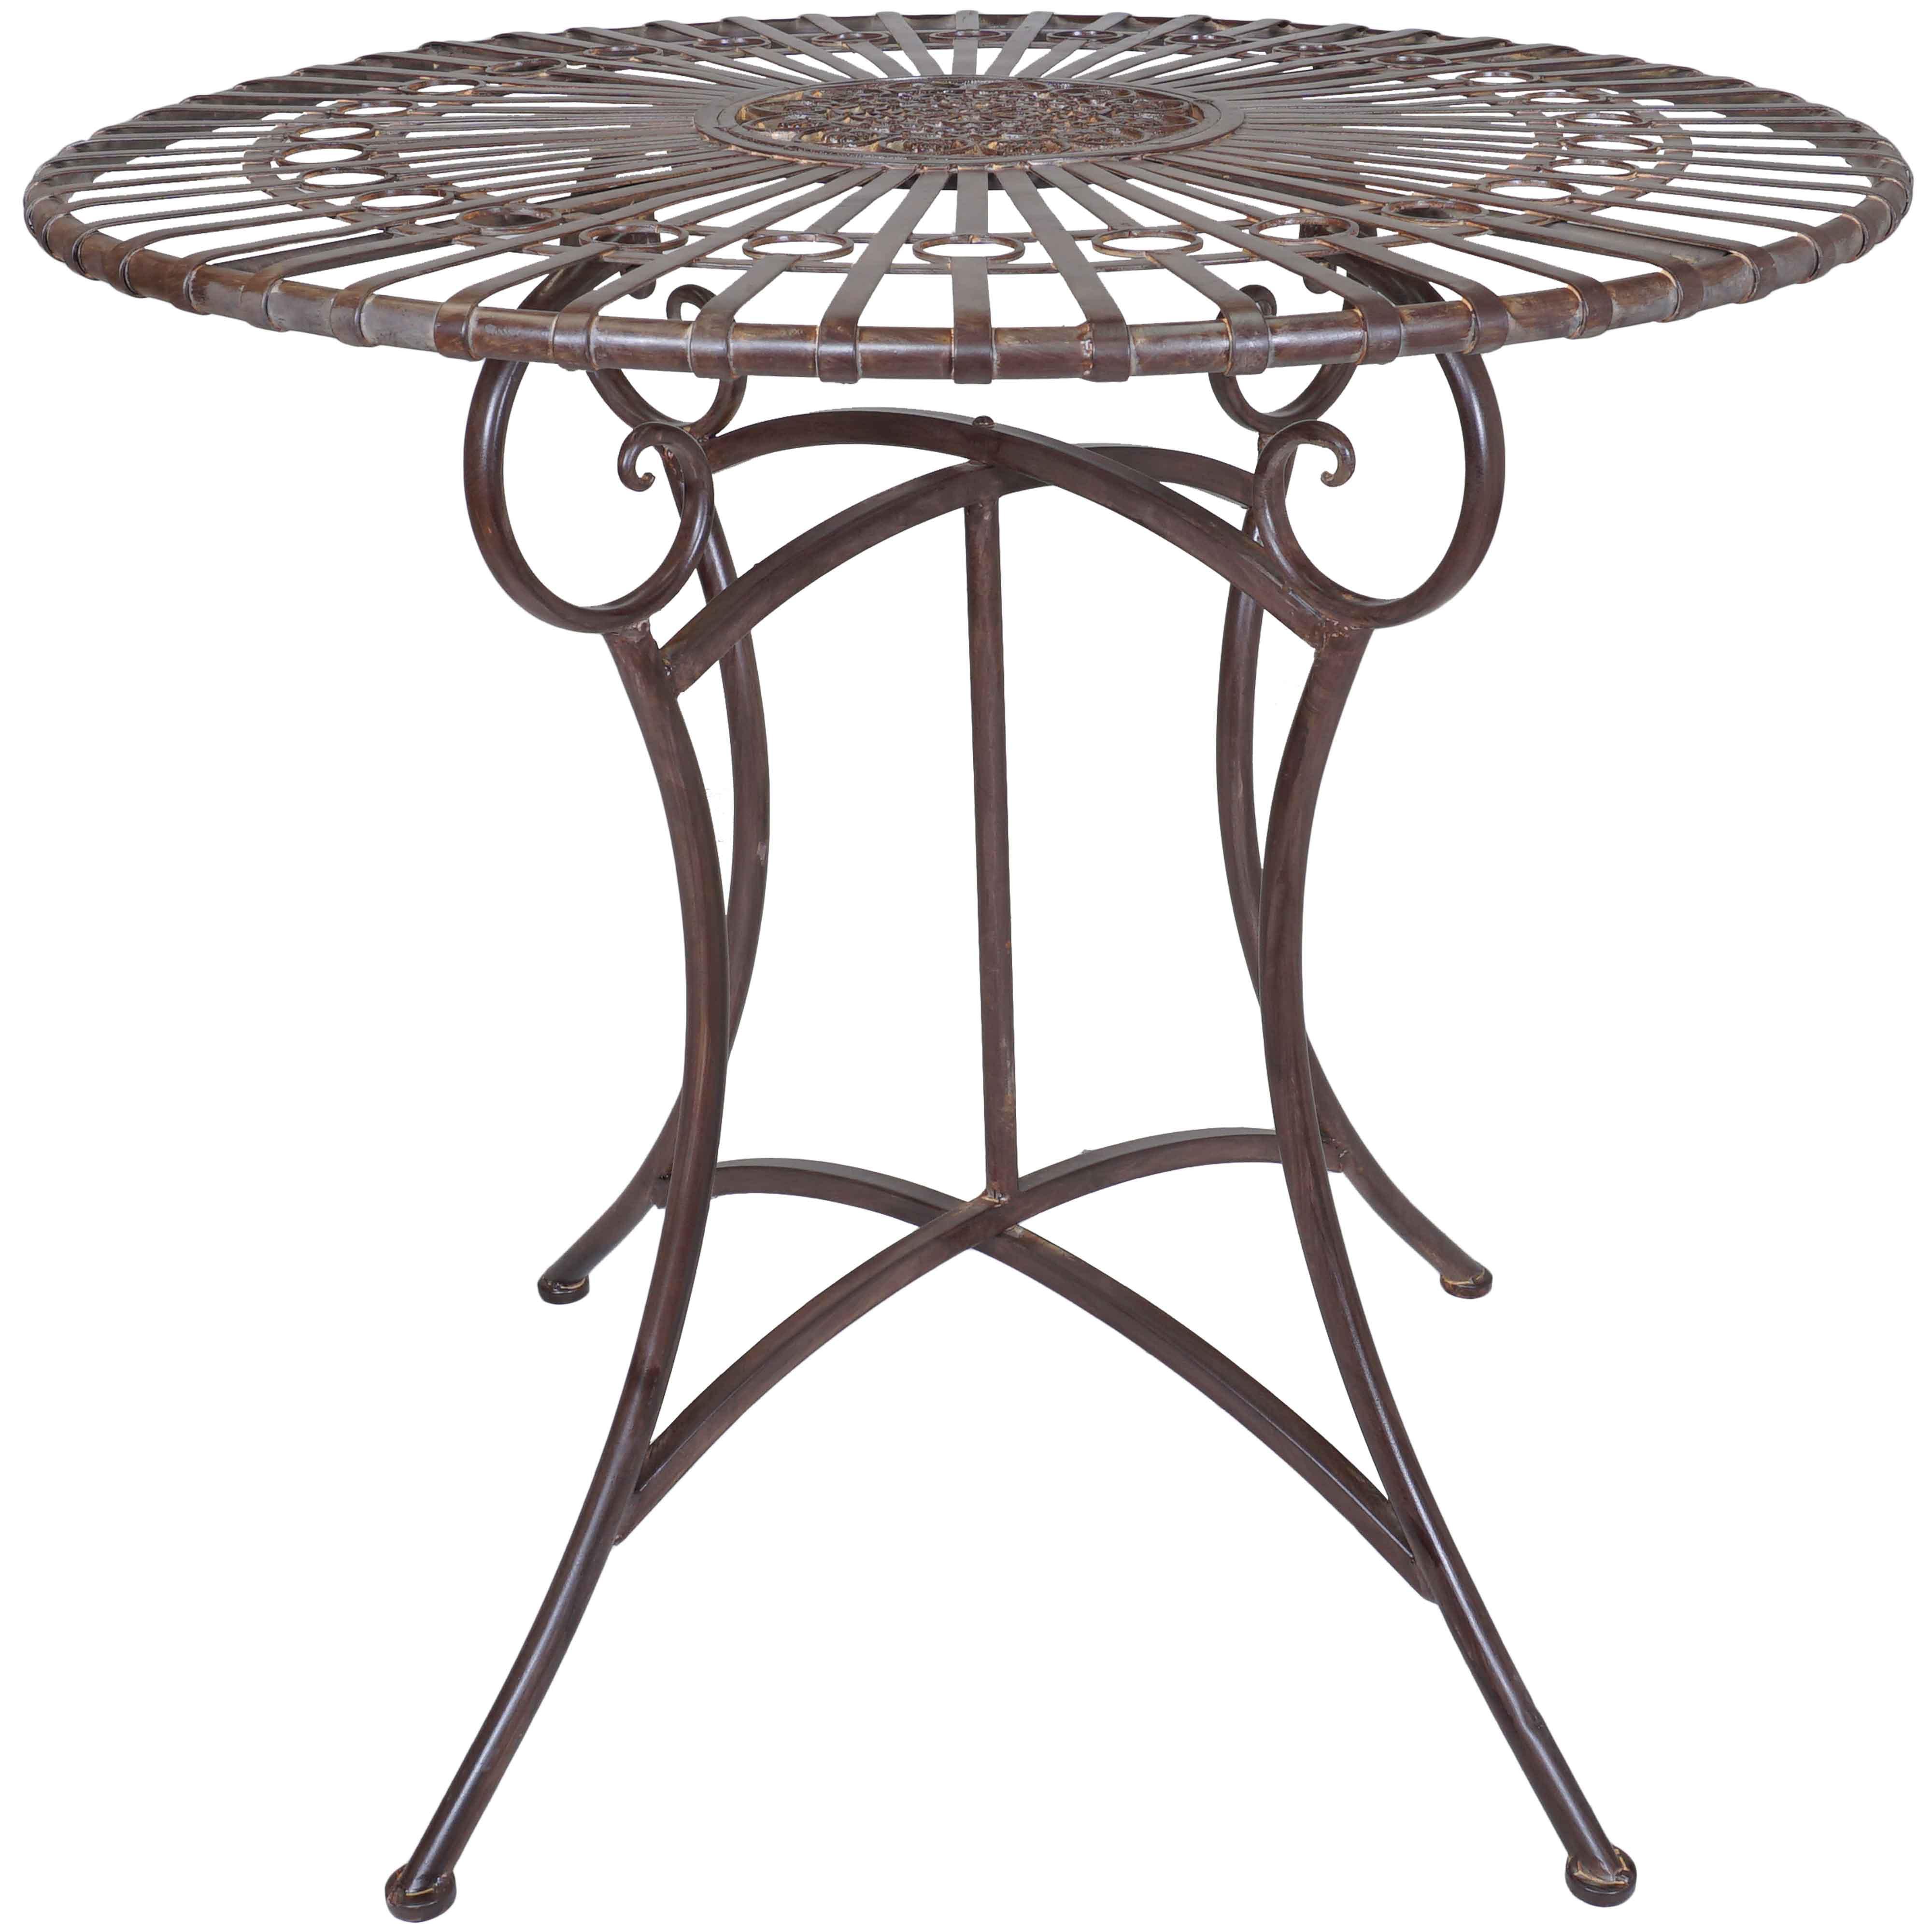 Titan Outdoor Rustic Antique Round Table Porch Patio Garden Deck Decor Rustic